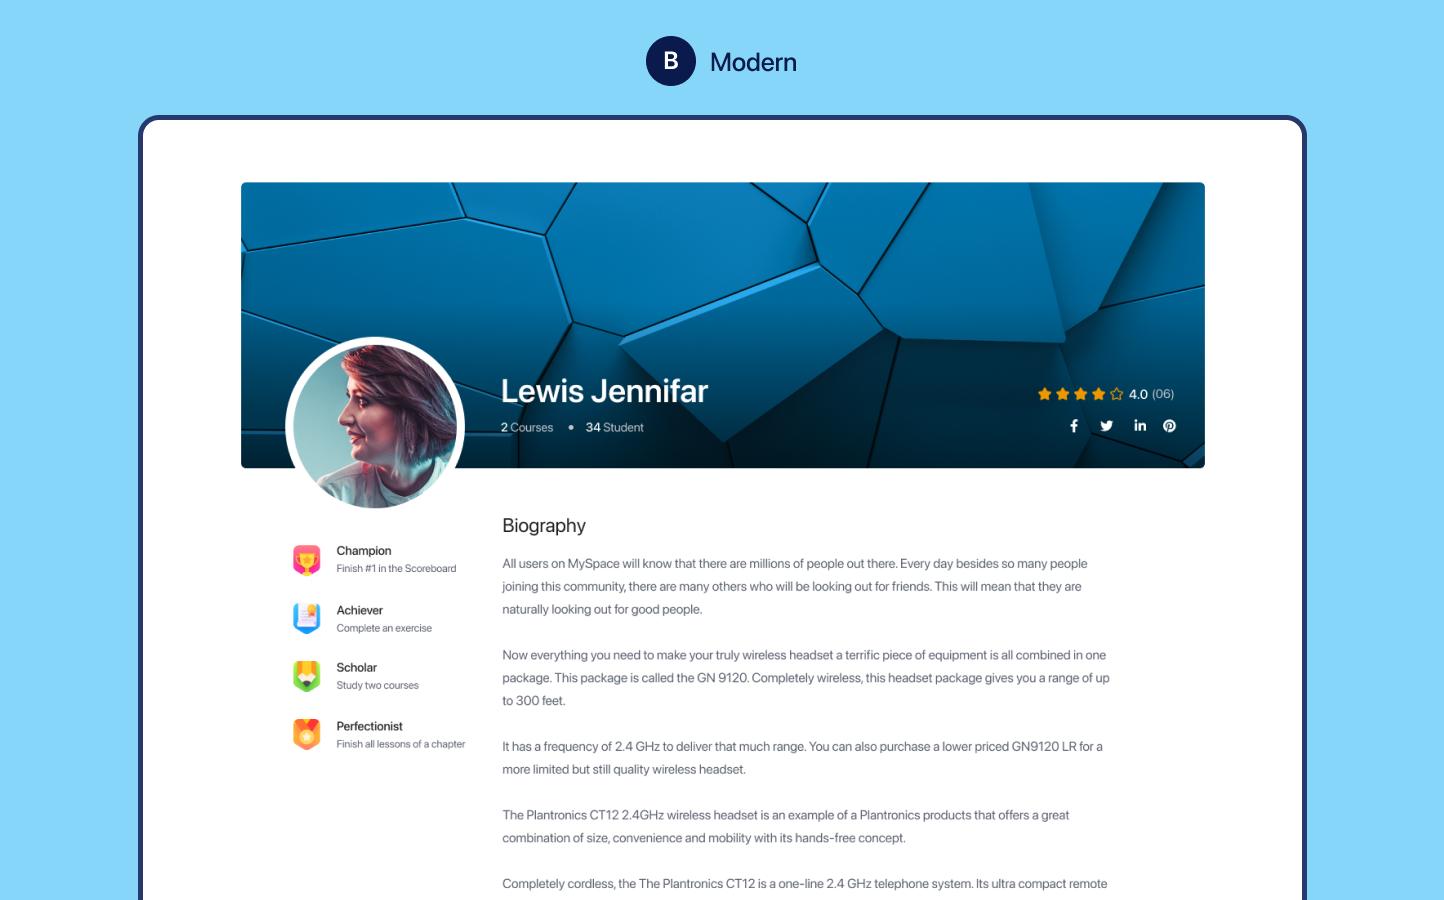 Modern Instructor Profile